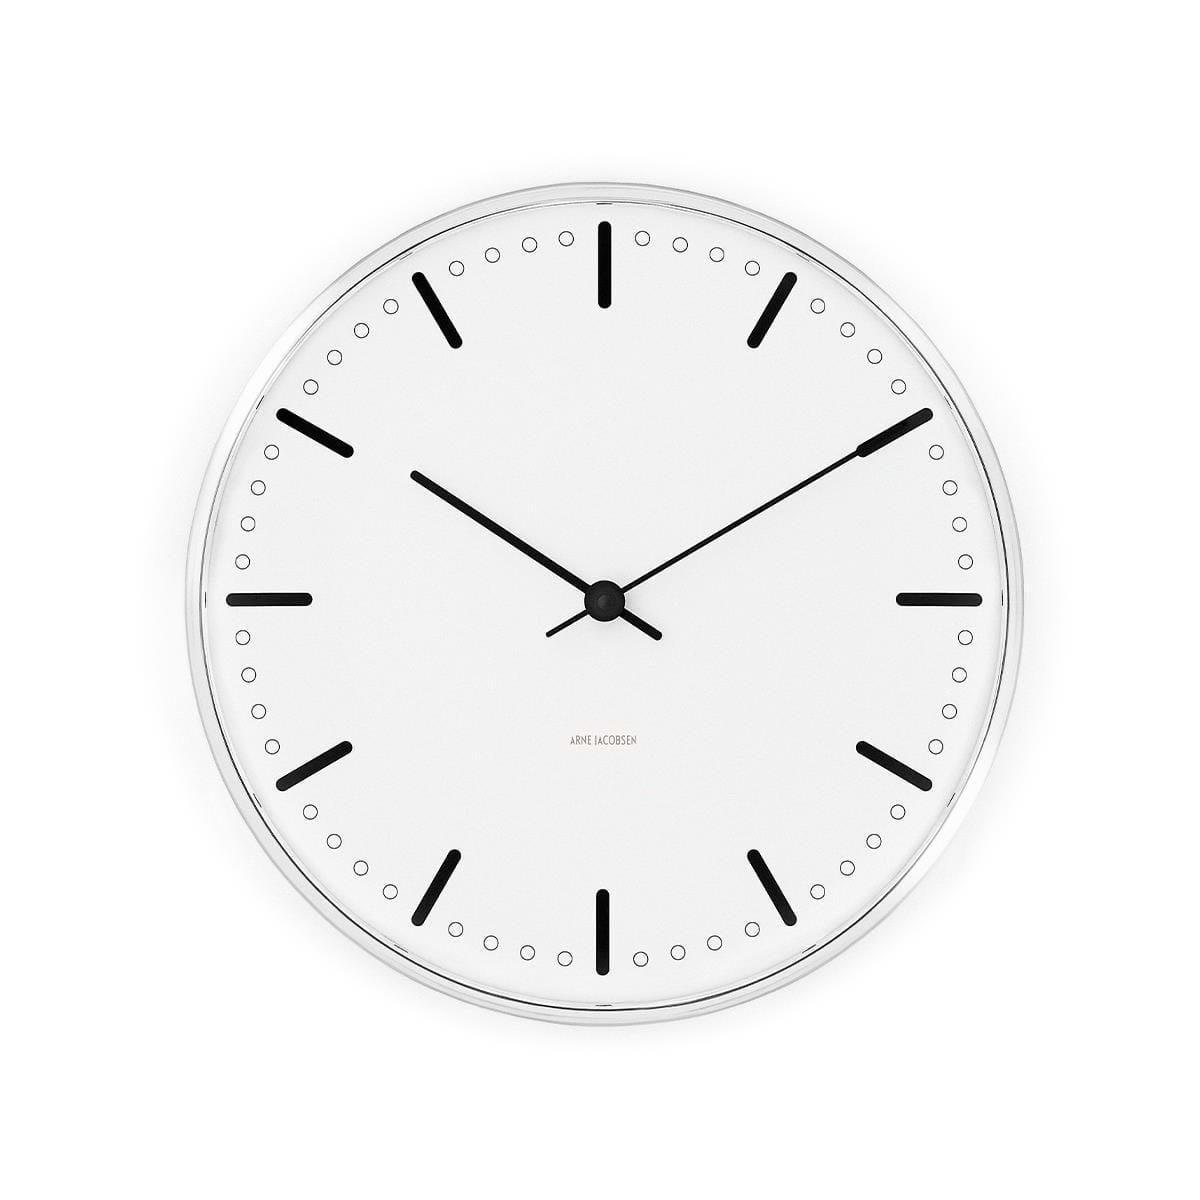 Arne Jacobsen - City Hall Wall Clock 29 cm - White (43641)